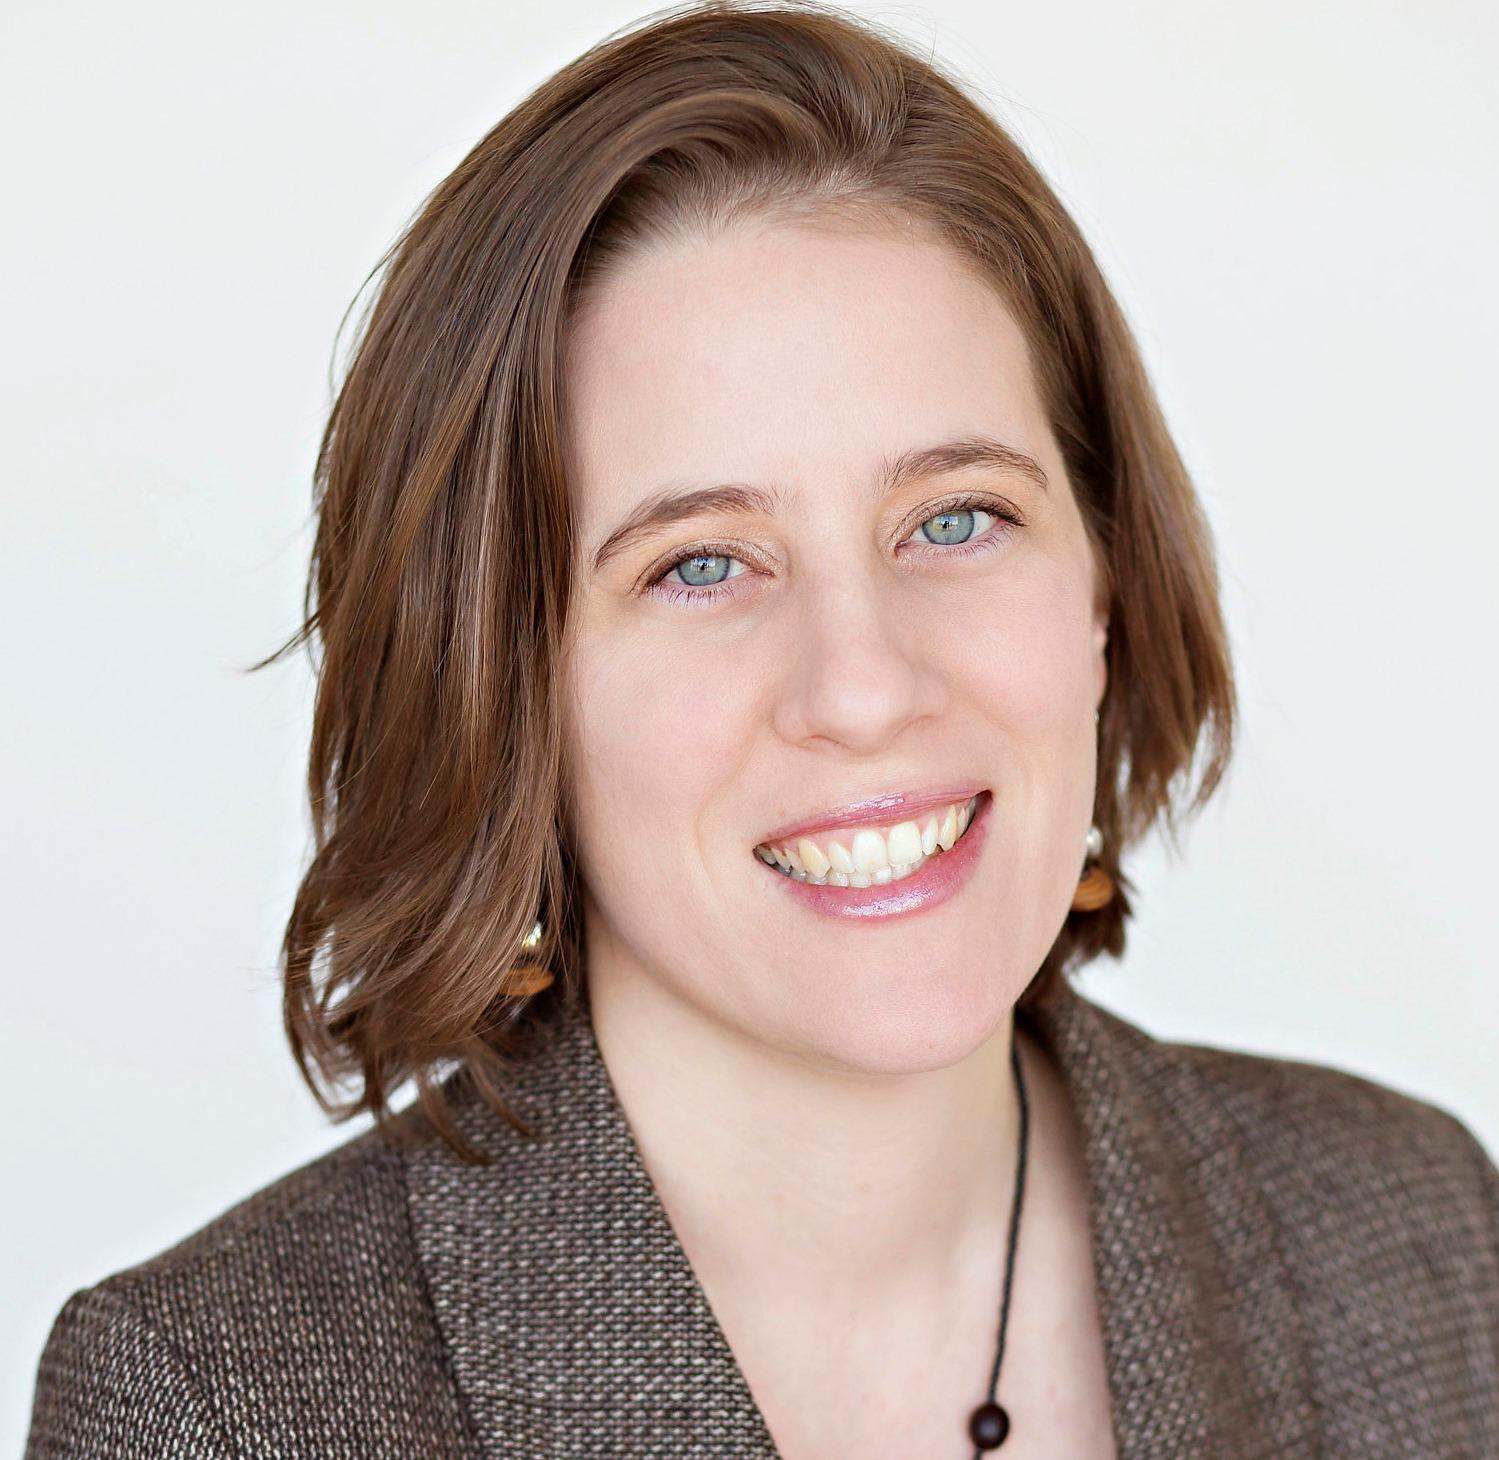 Heather Ranck